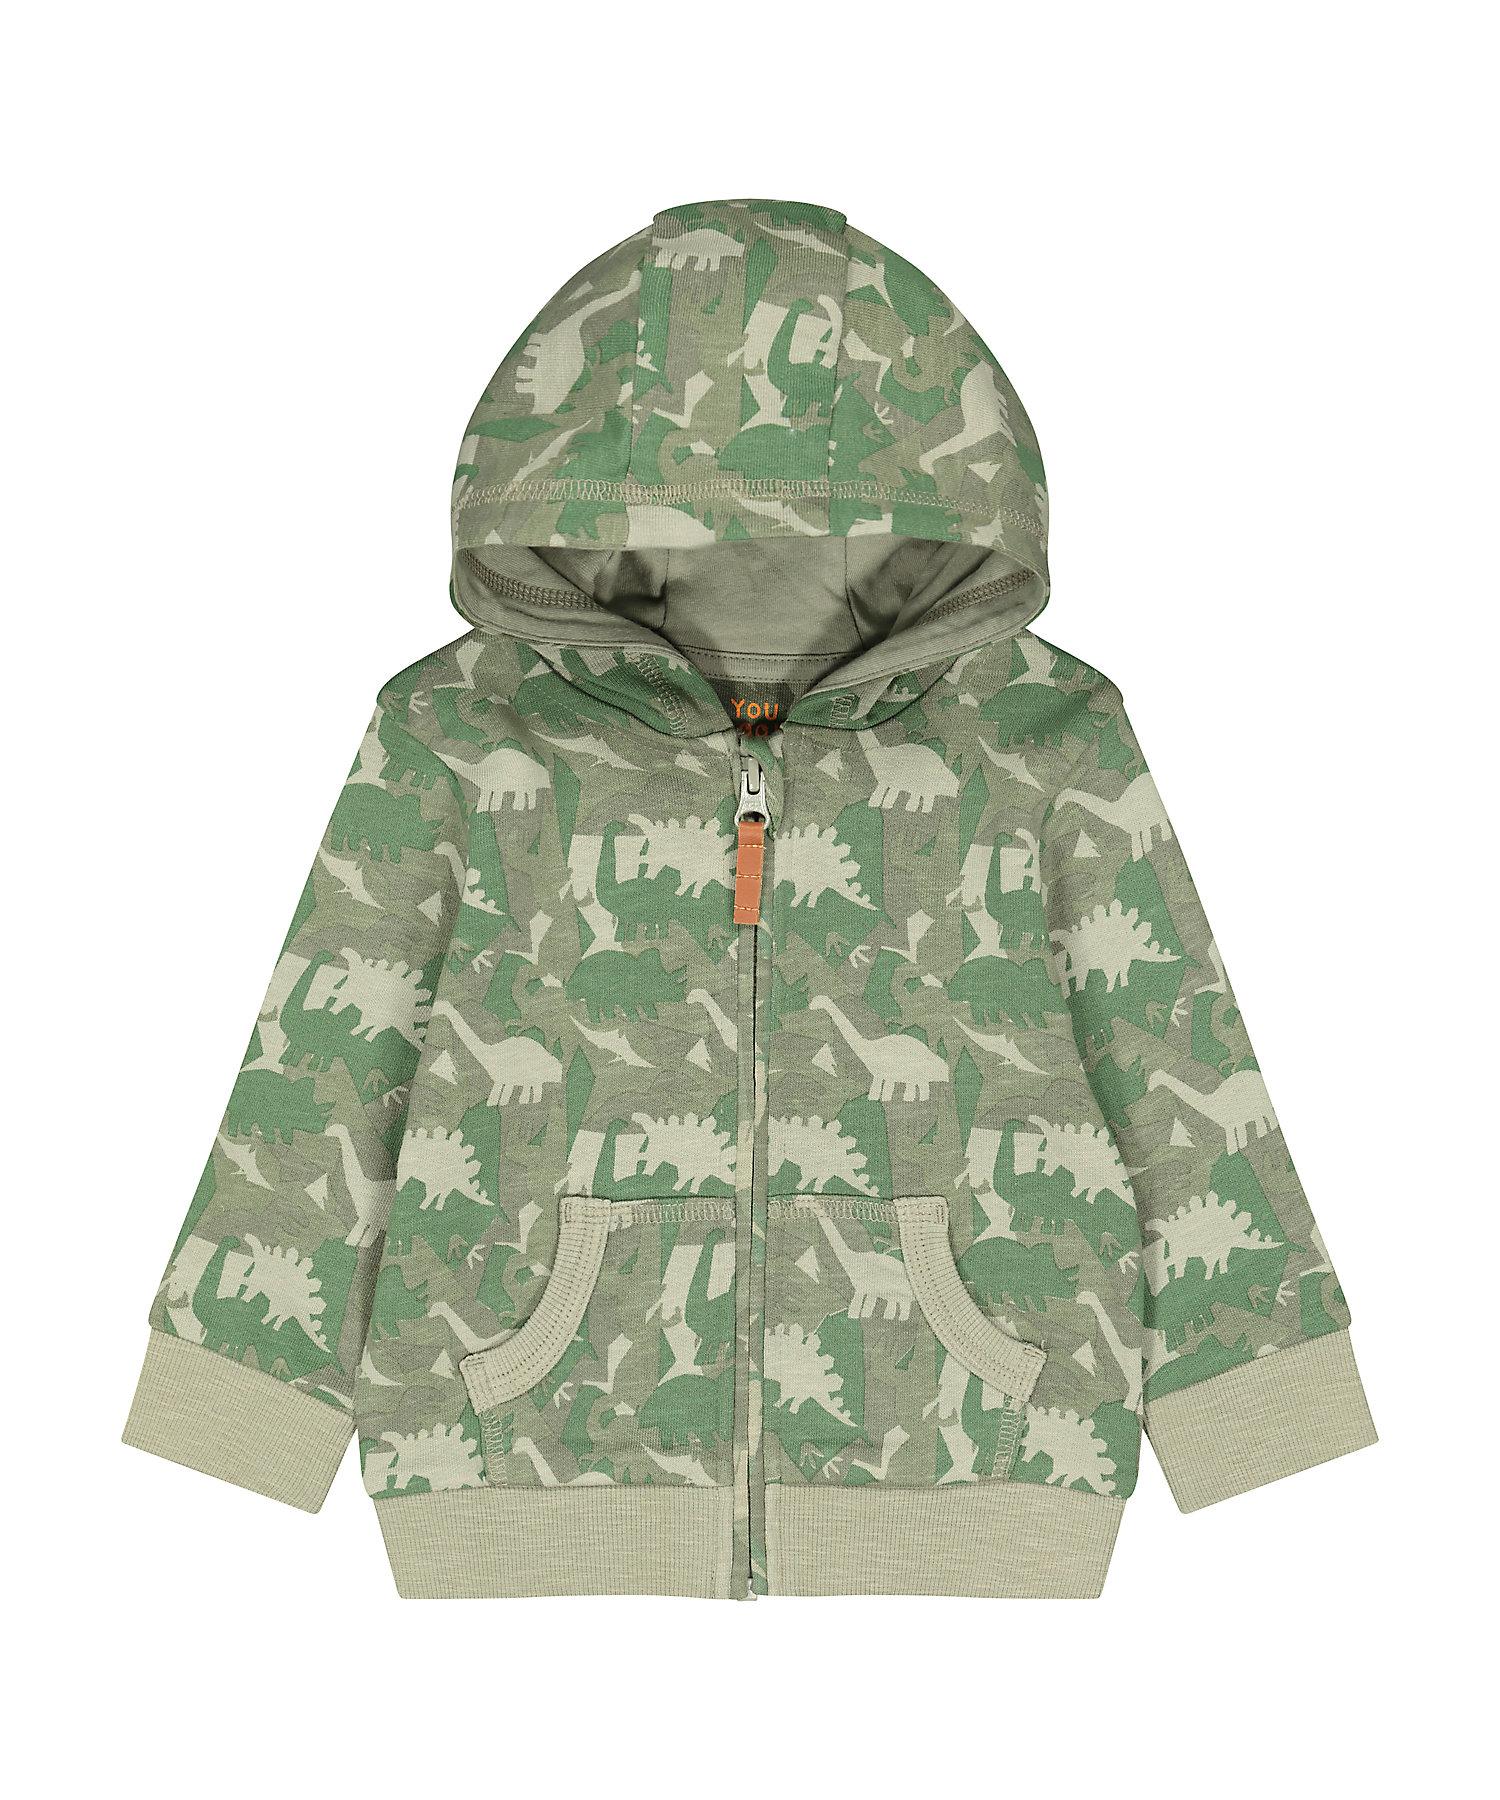 Mothercare   Boys Full Sleeves Hooded Sweatshirt Dino Print - Khaki